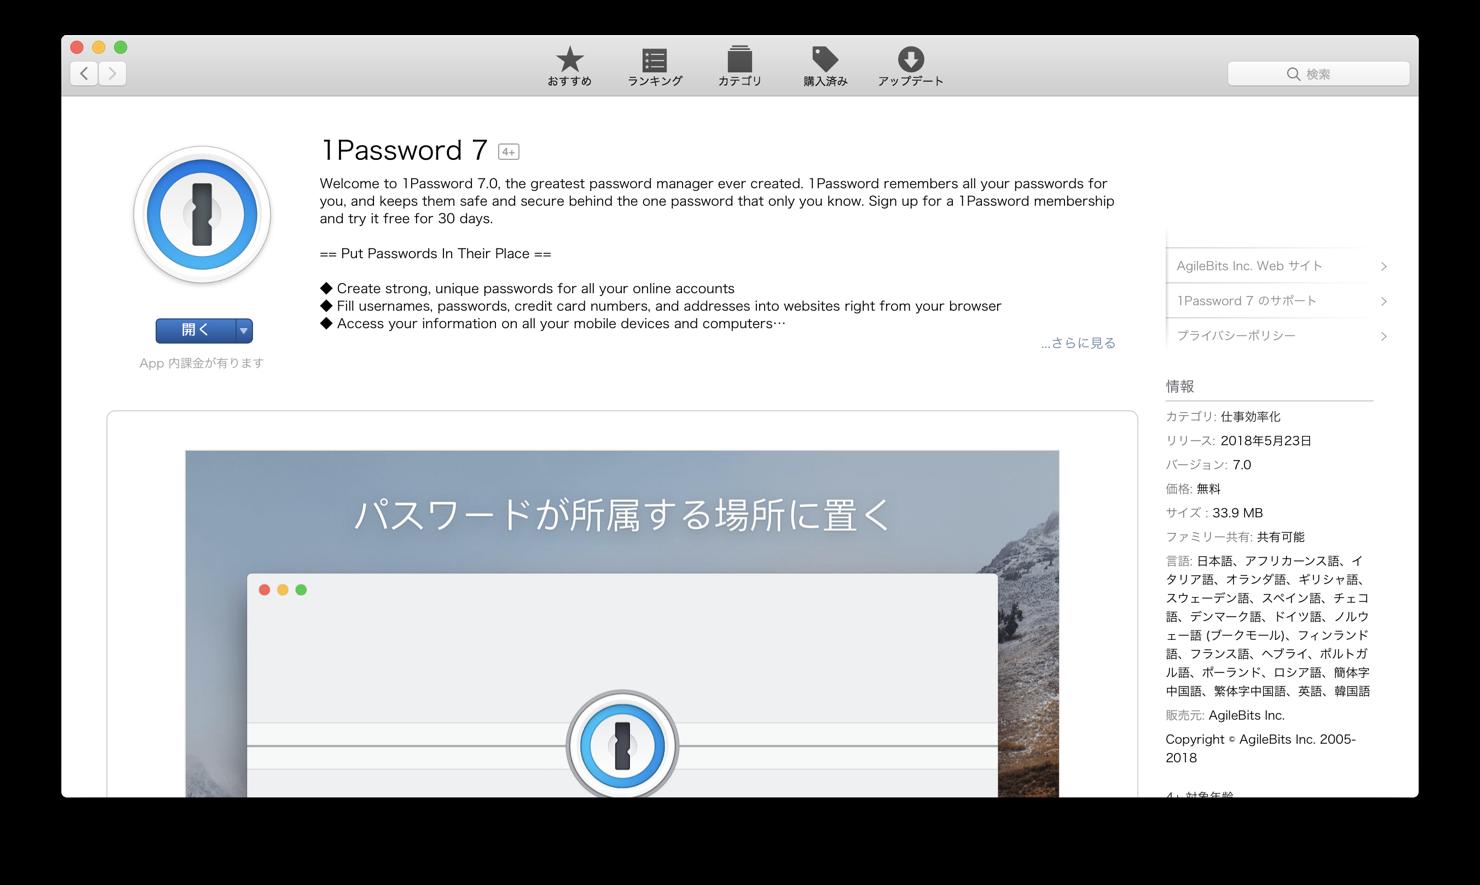 1Password 7 App storeのスクリーンショット